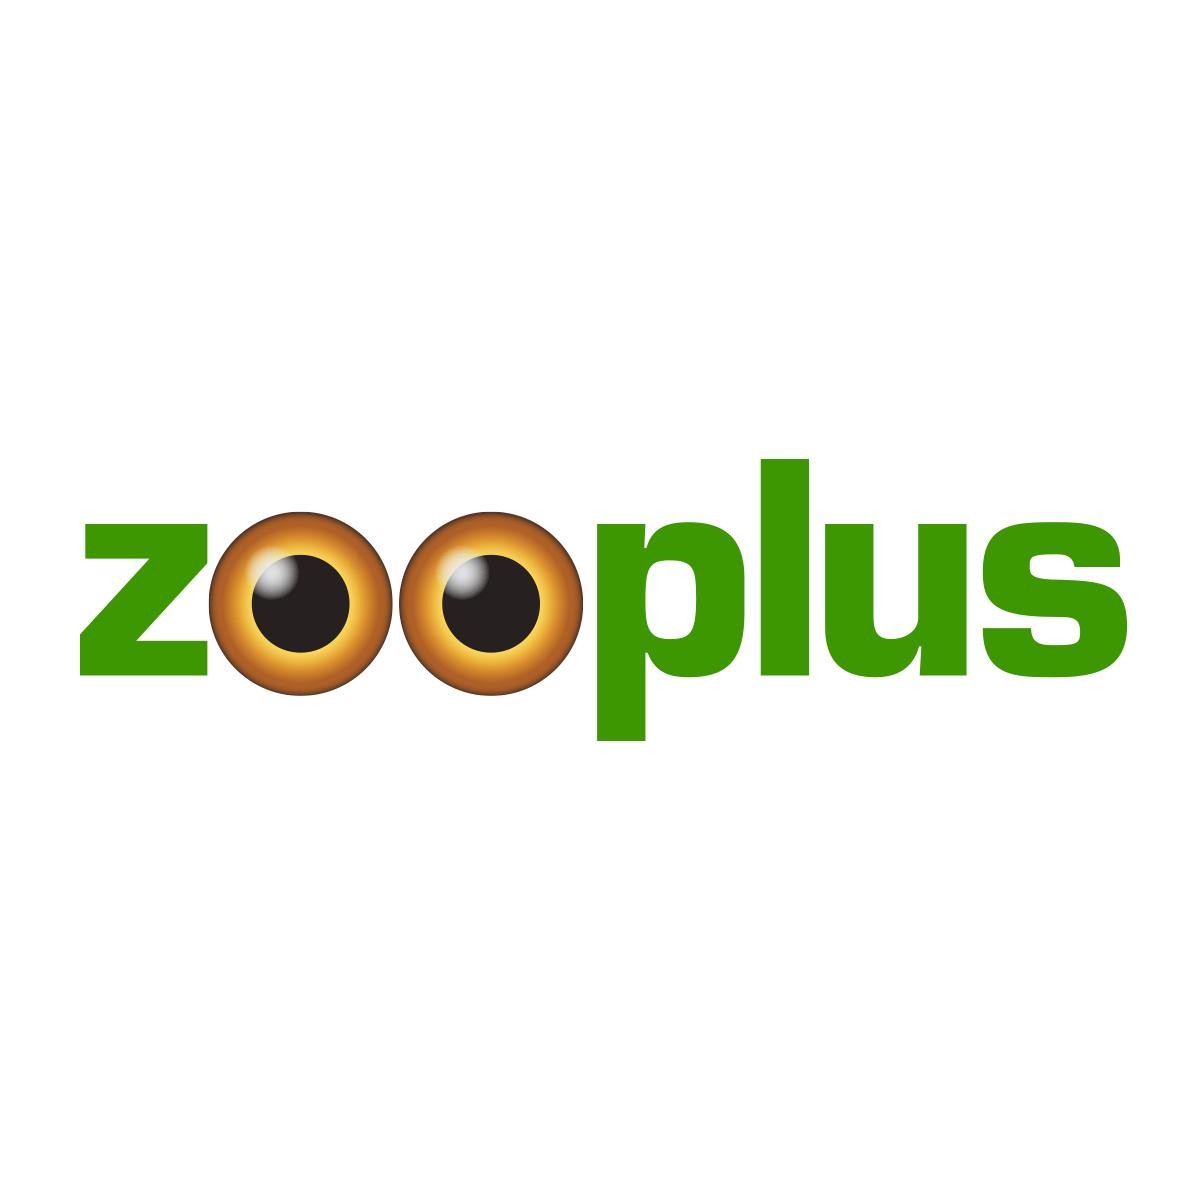 zooplus-gallery